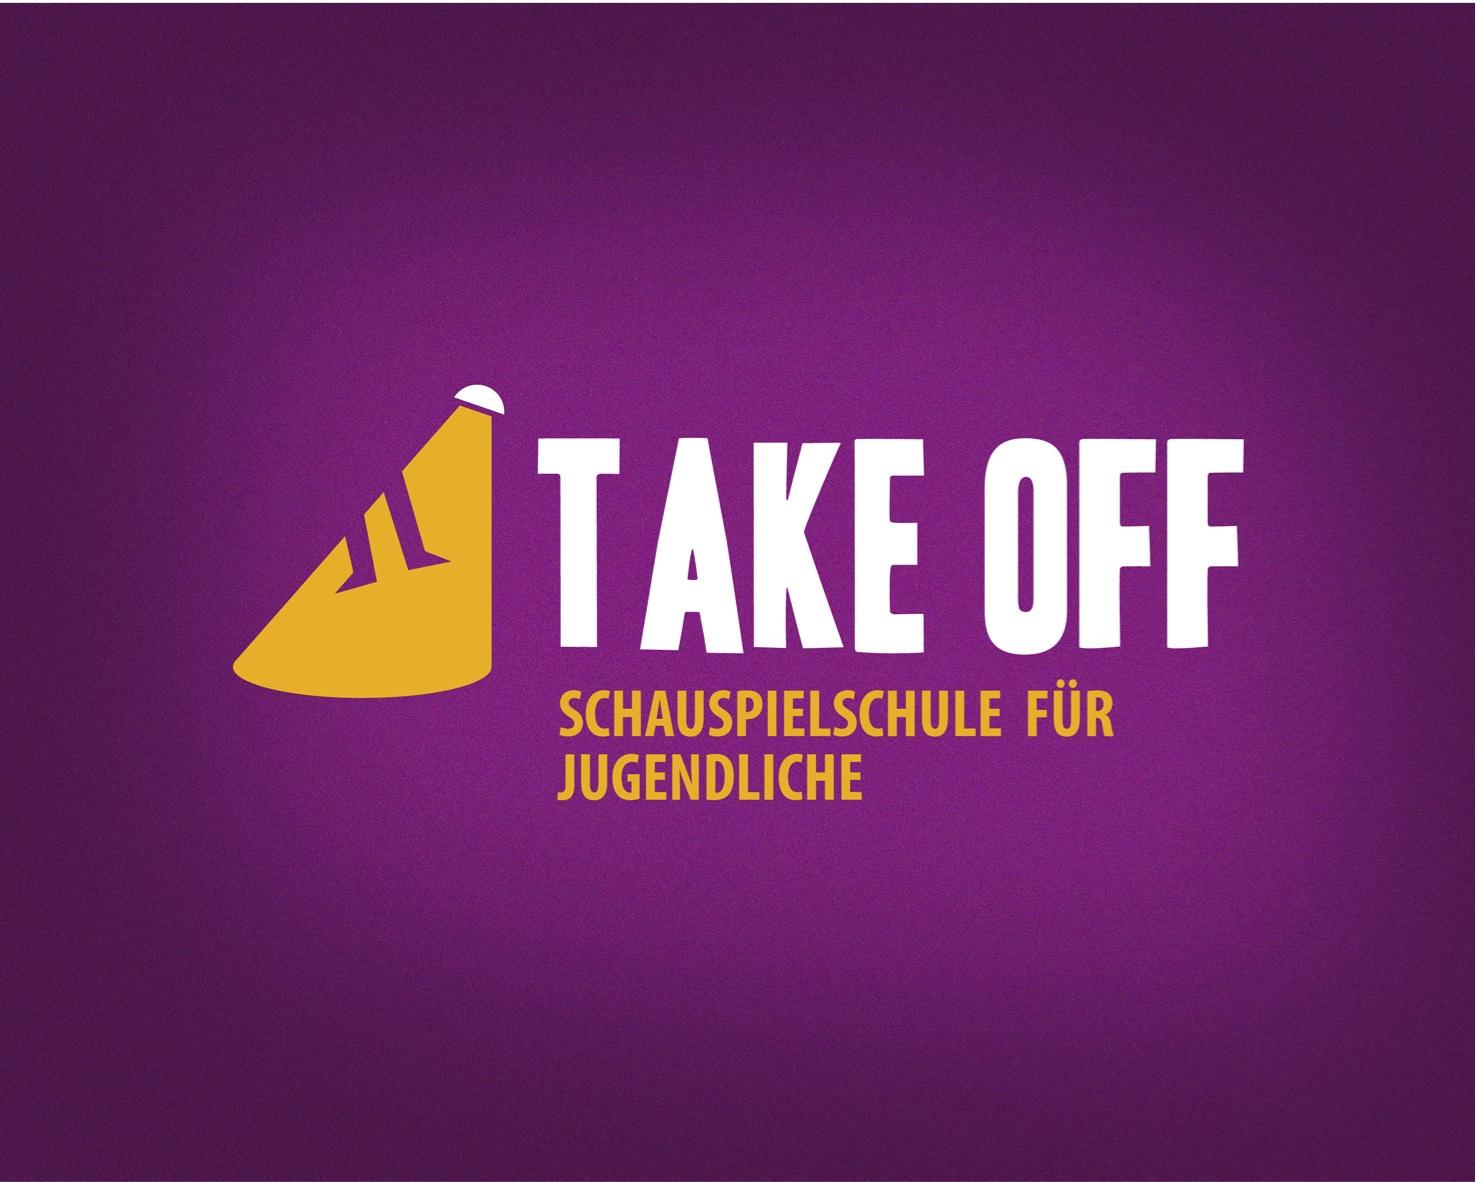 Bilddatei: Logo_TAKE_OFF.jpg